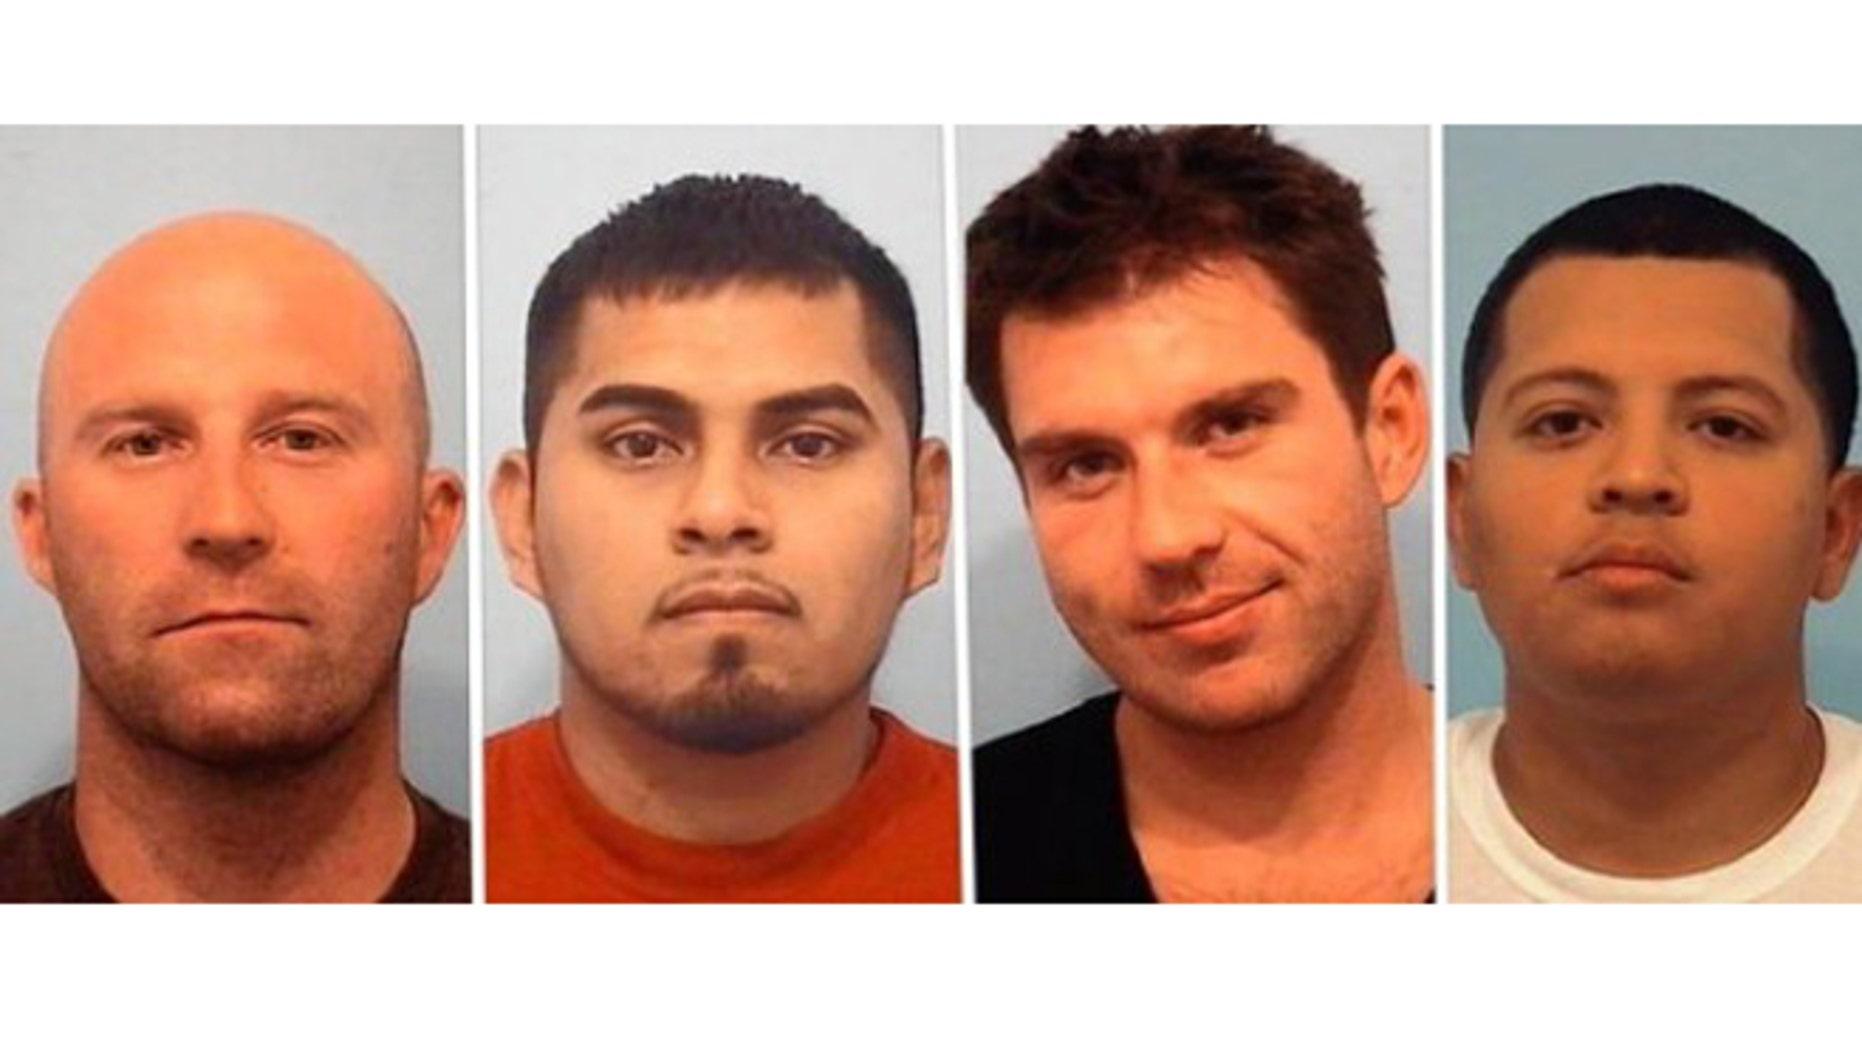 From left: Marcin K. Klepinowski, Andres Lopez, Swavek Krakowiak and Jesus Nino. (Naperville Police Department photos)